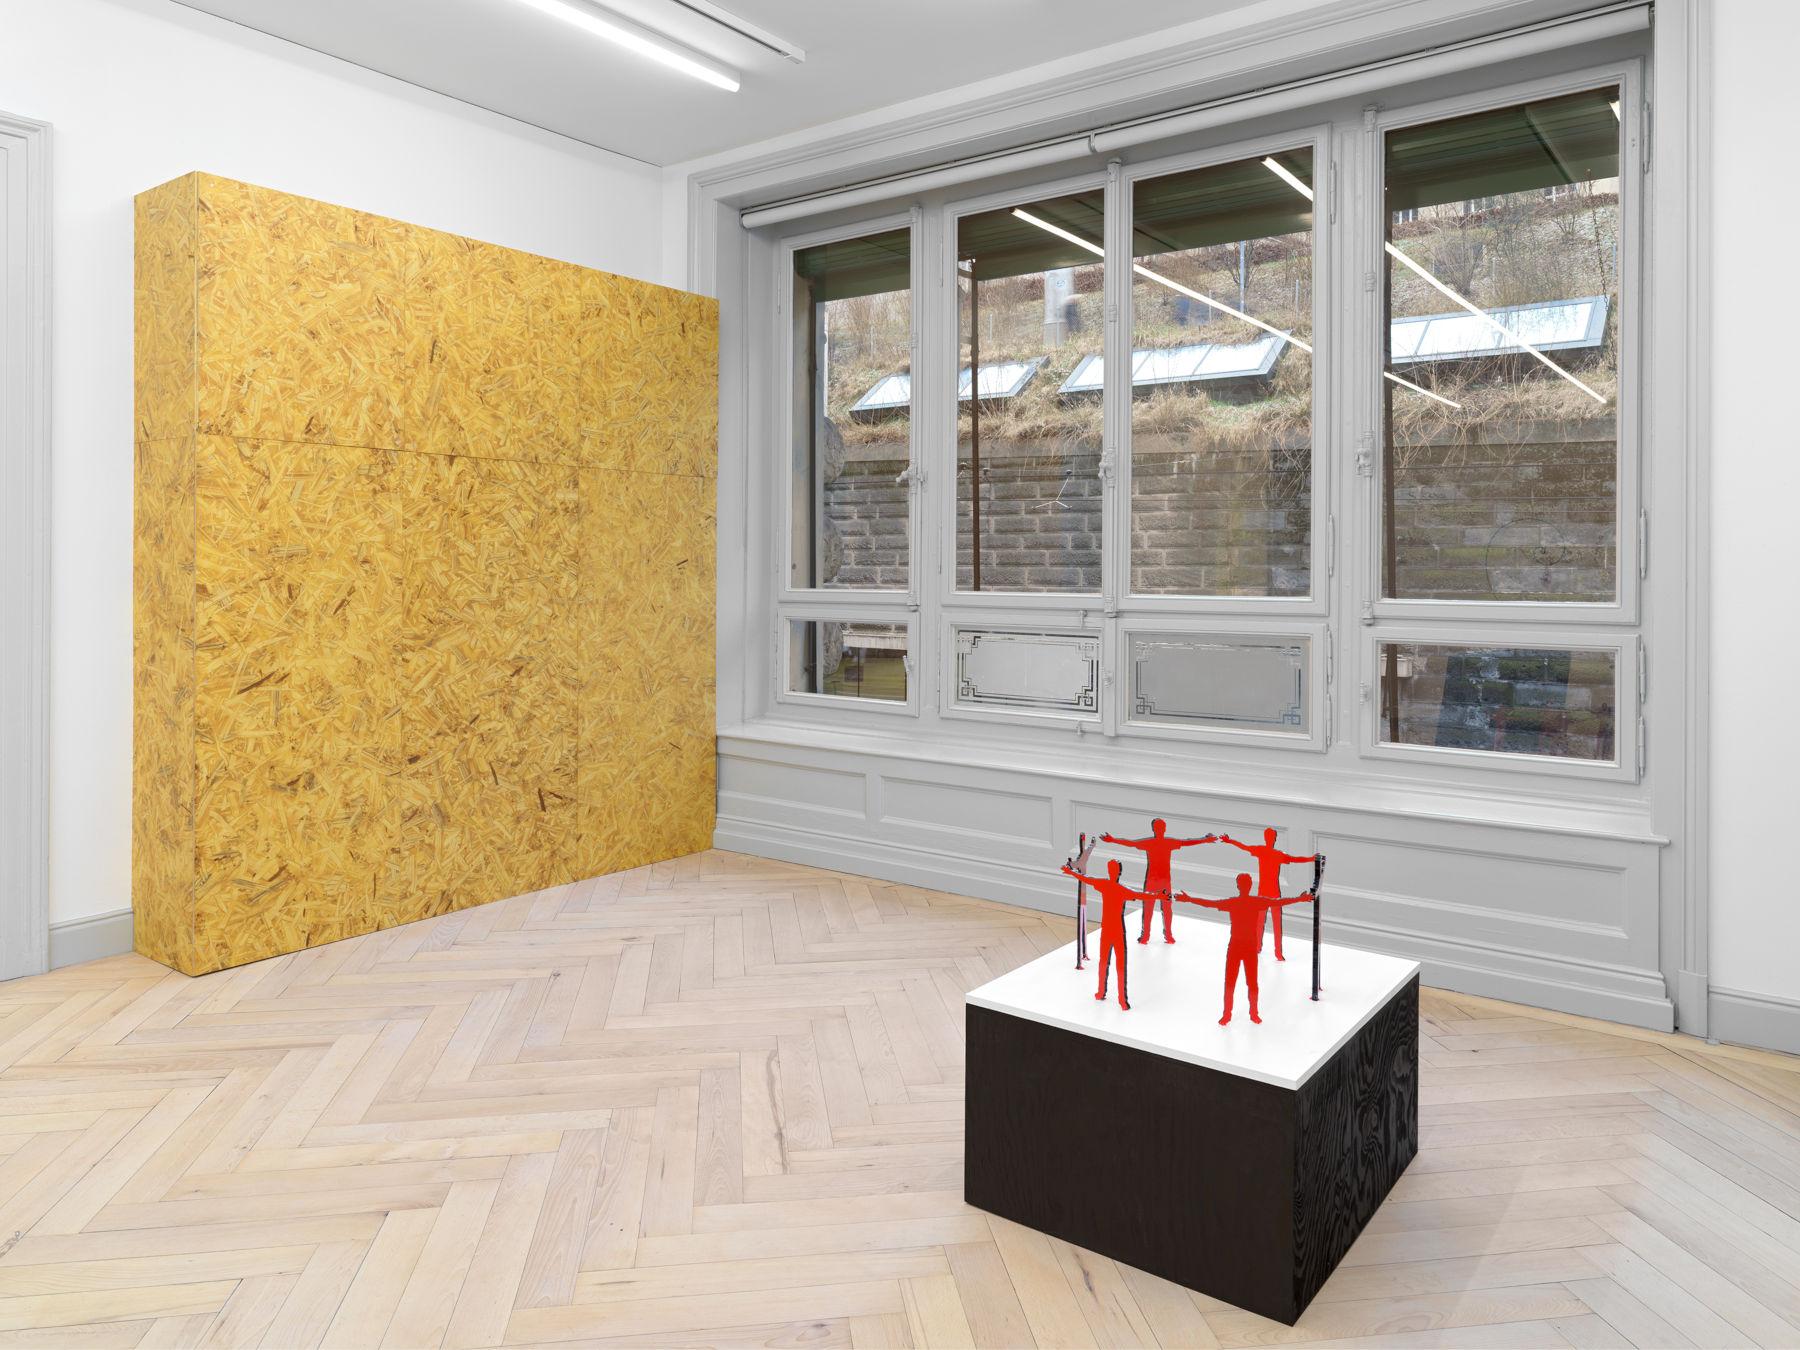 Galerie Eva Presenhuber Valentin Carron 1